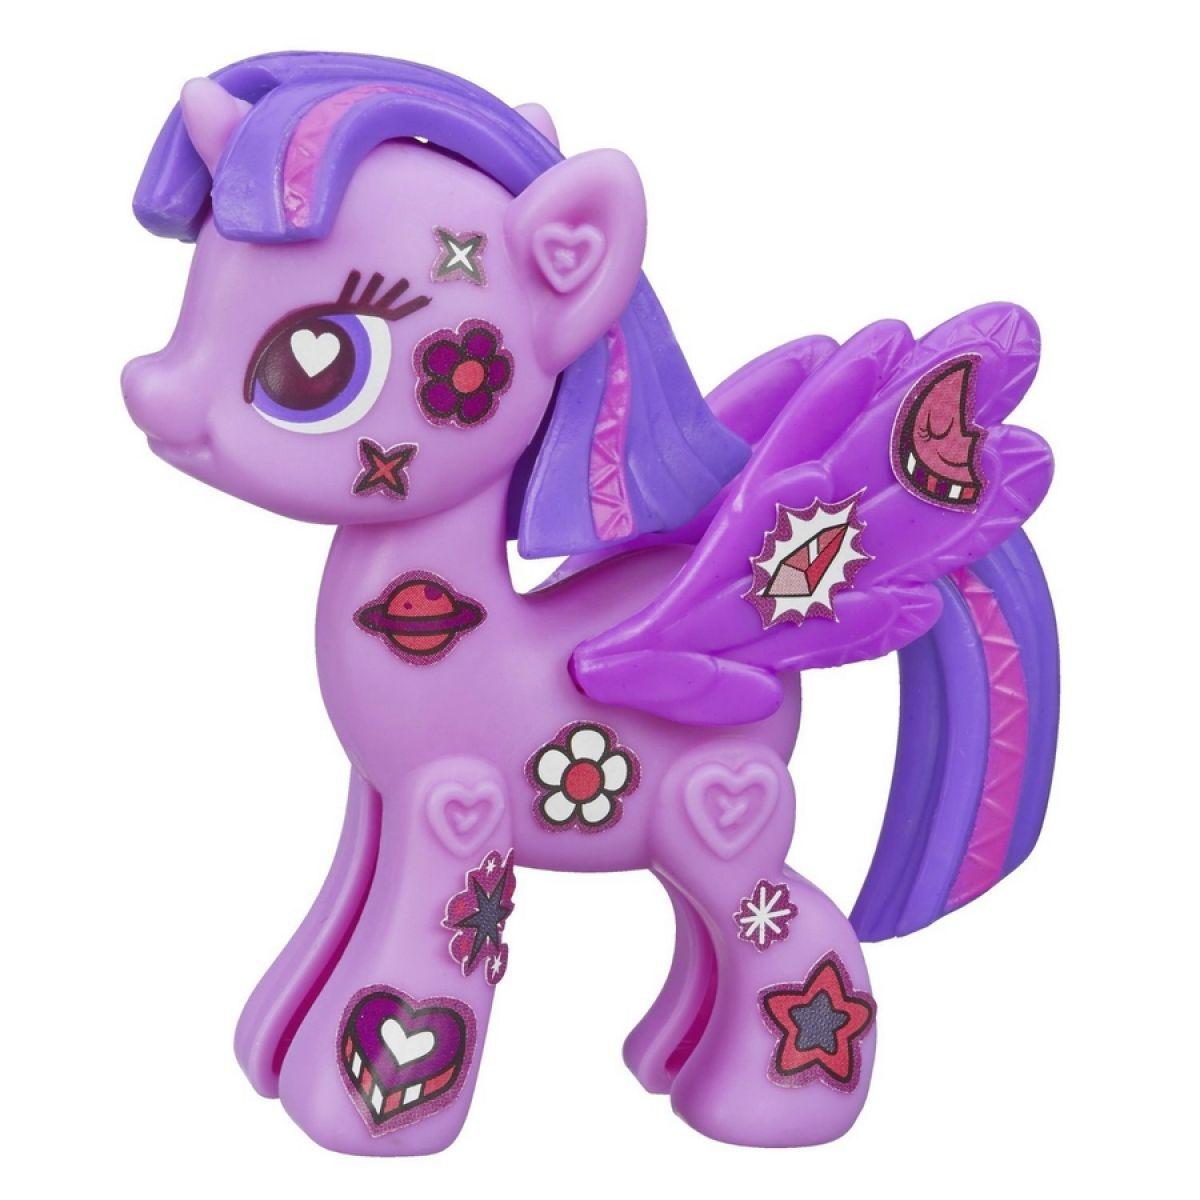 My Little Pony Pop Starter Kit - Twilight Sparkle